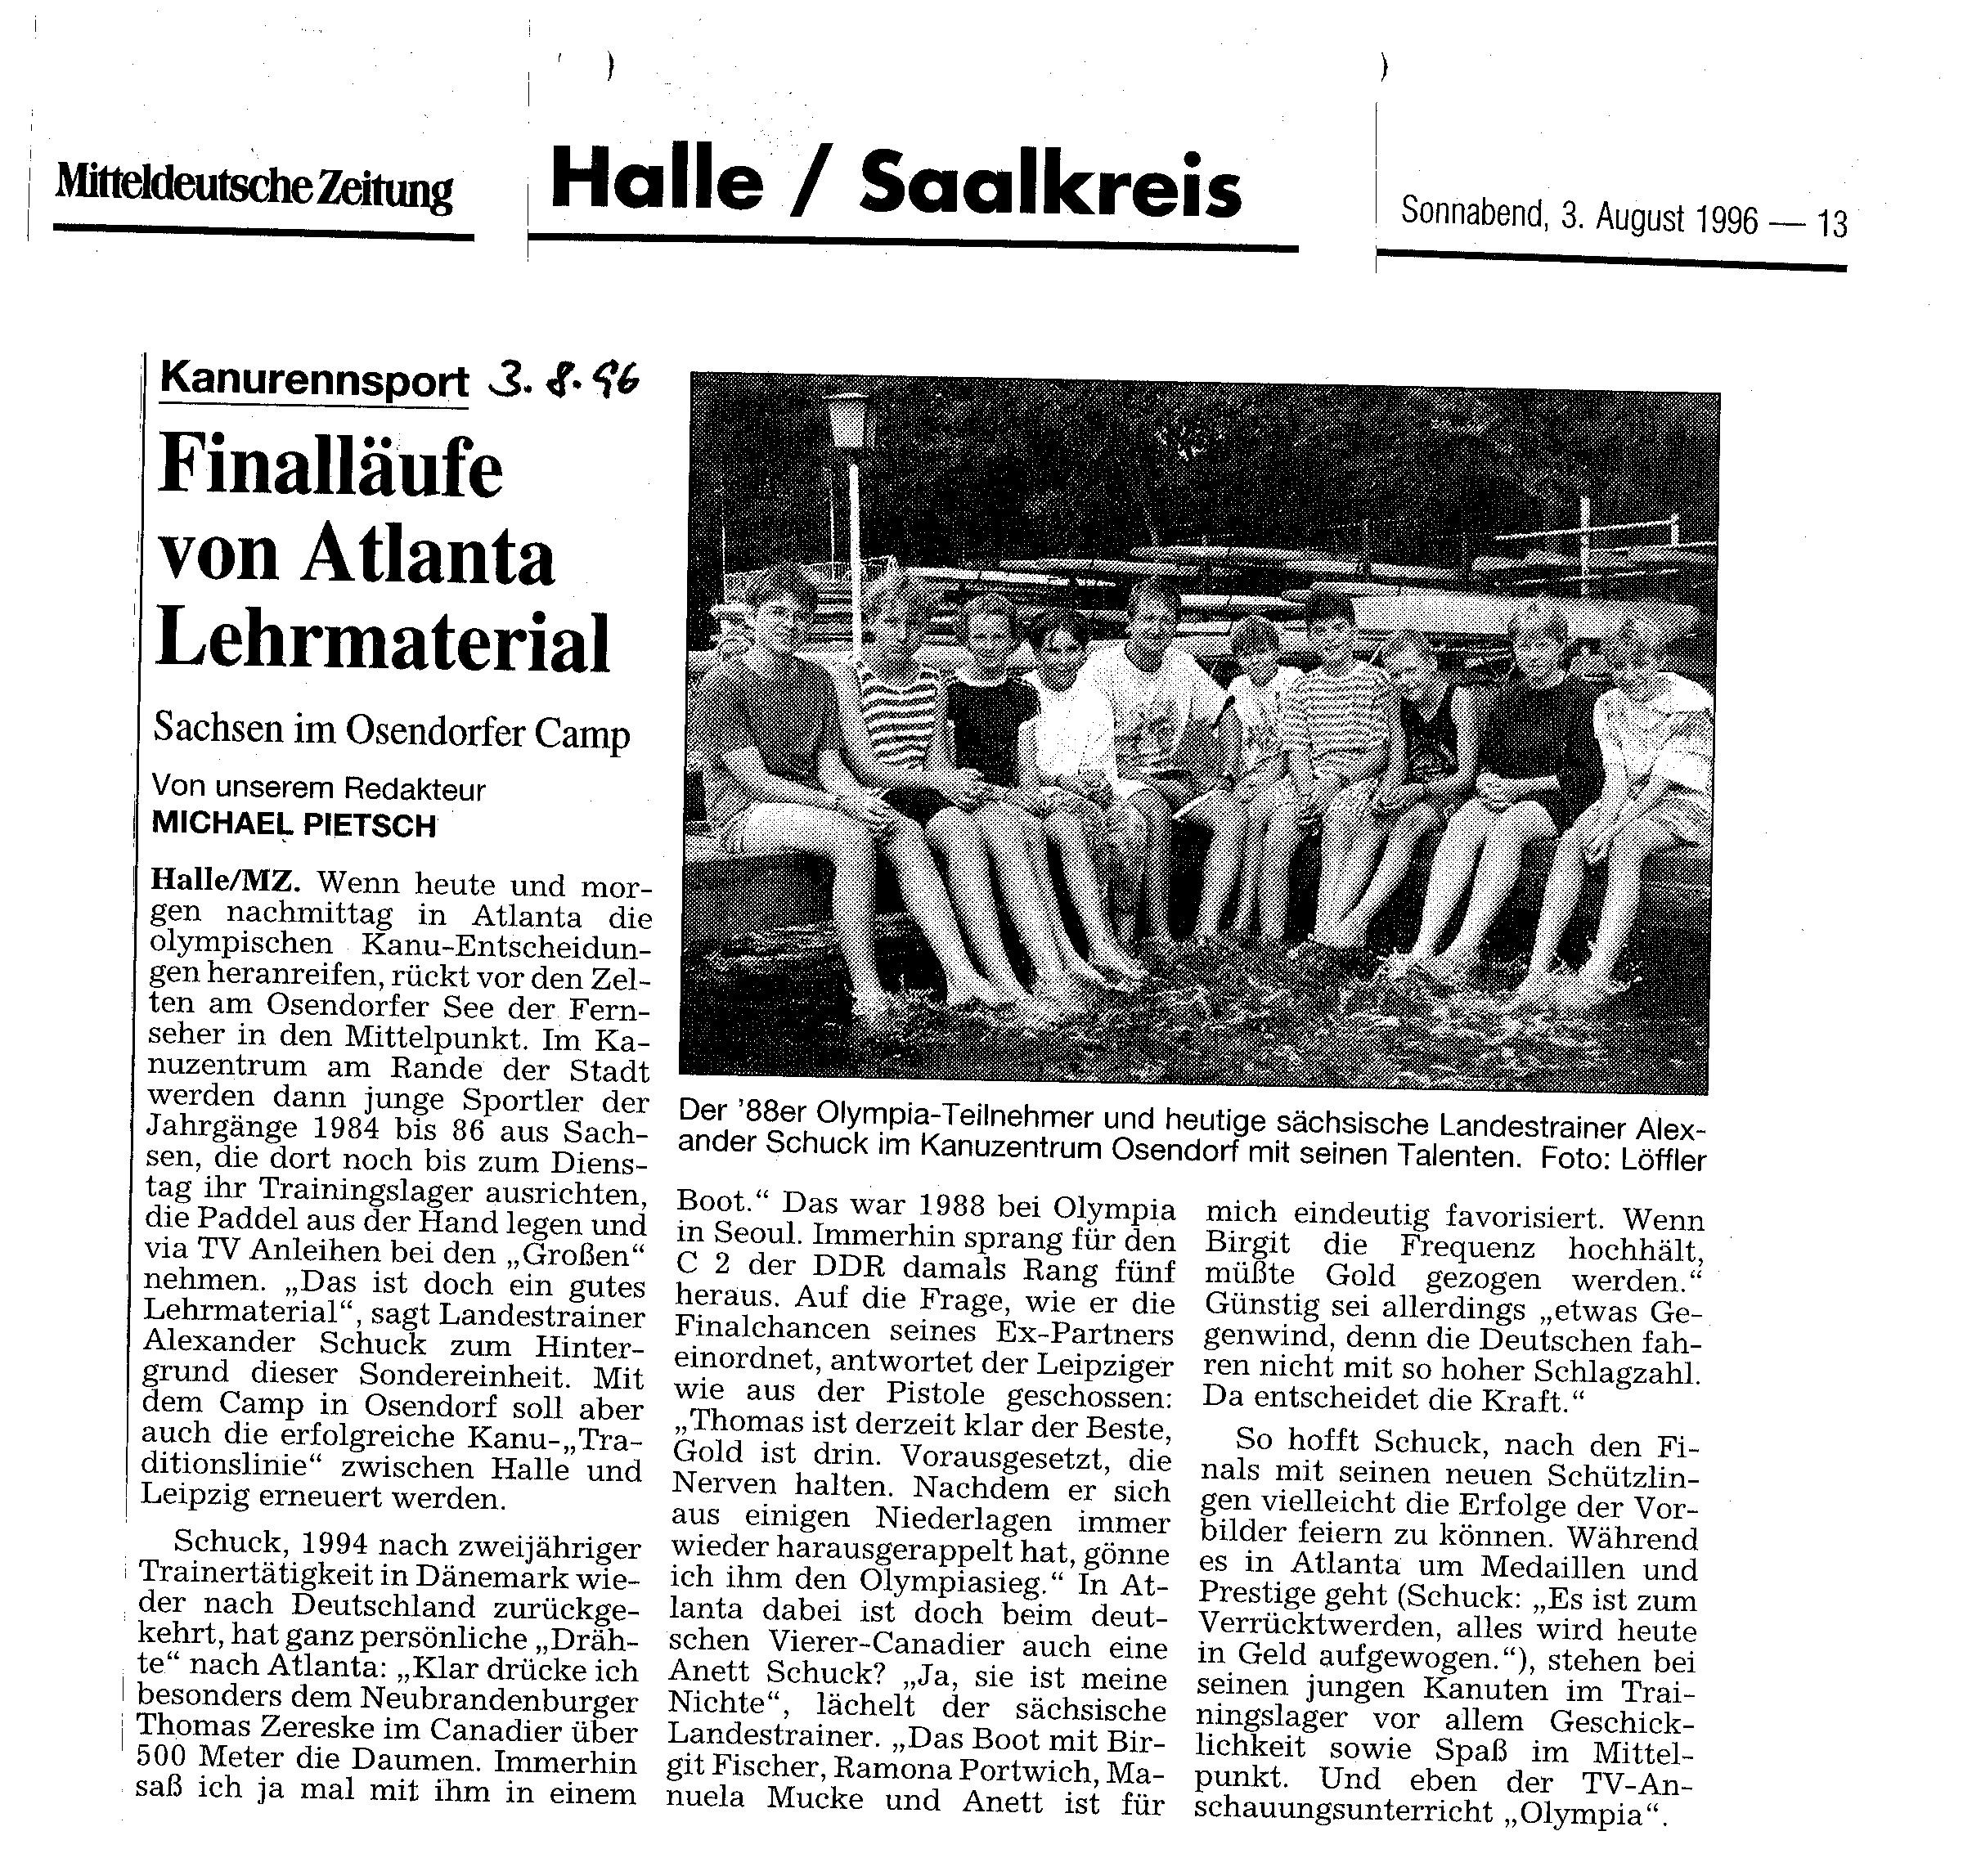 1996-08-03 MZ Finalläufe von Atlanta Lehrmaterial